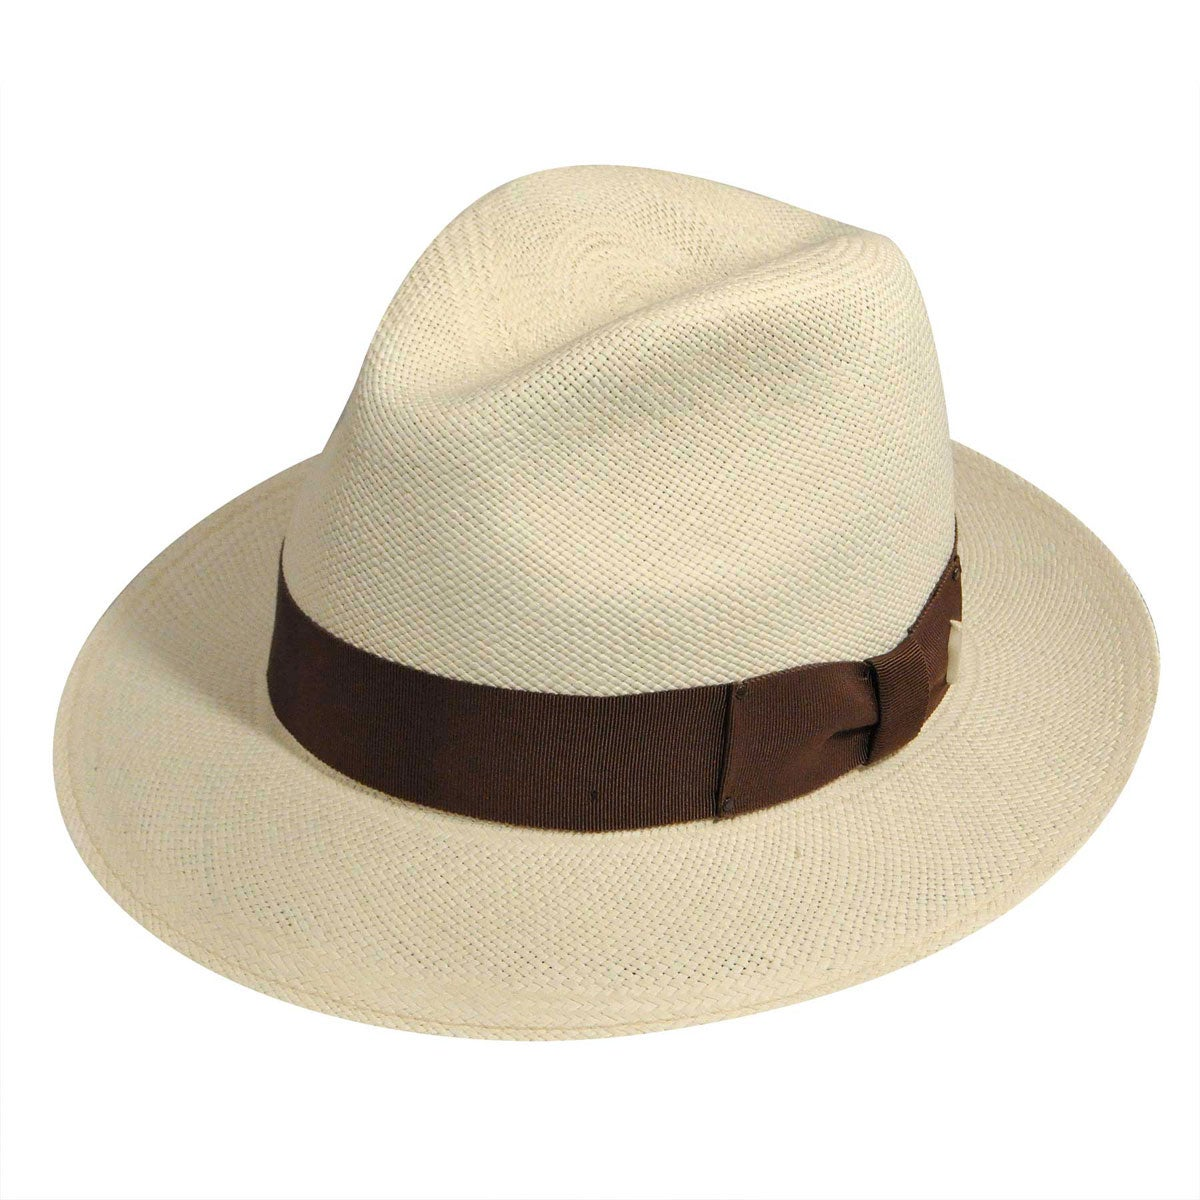 1940s Mens Hat Styles and History Thurman Panama $150.00 AT vintagedancer.com